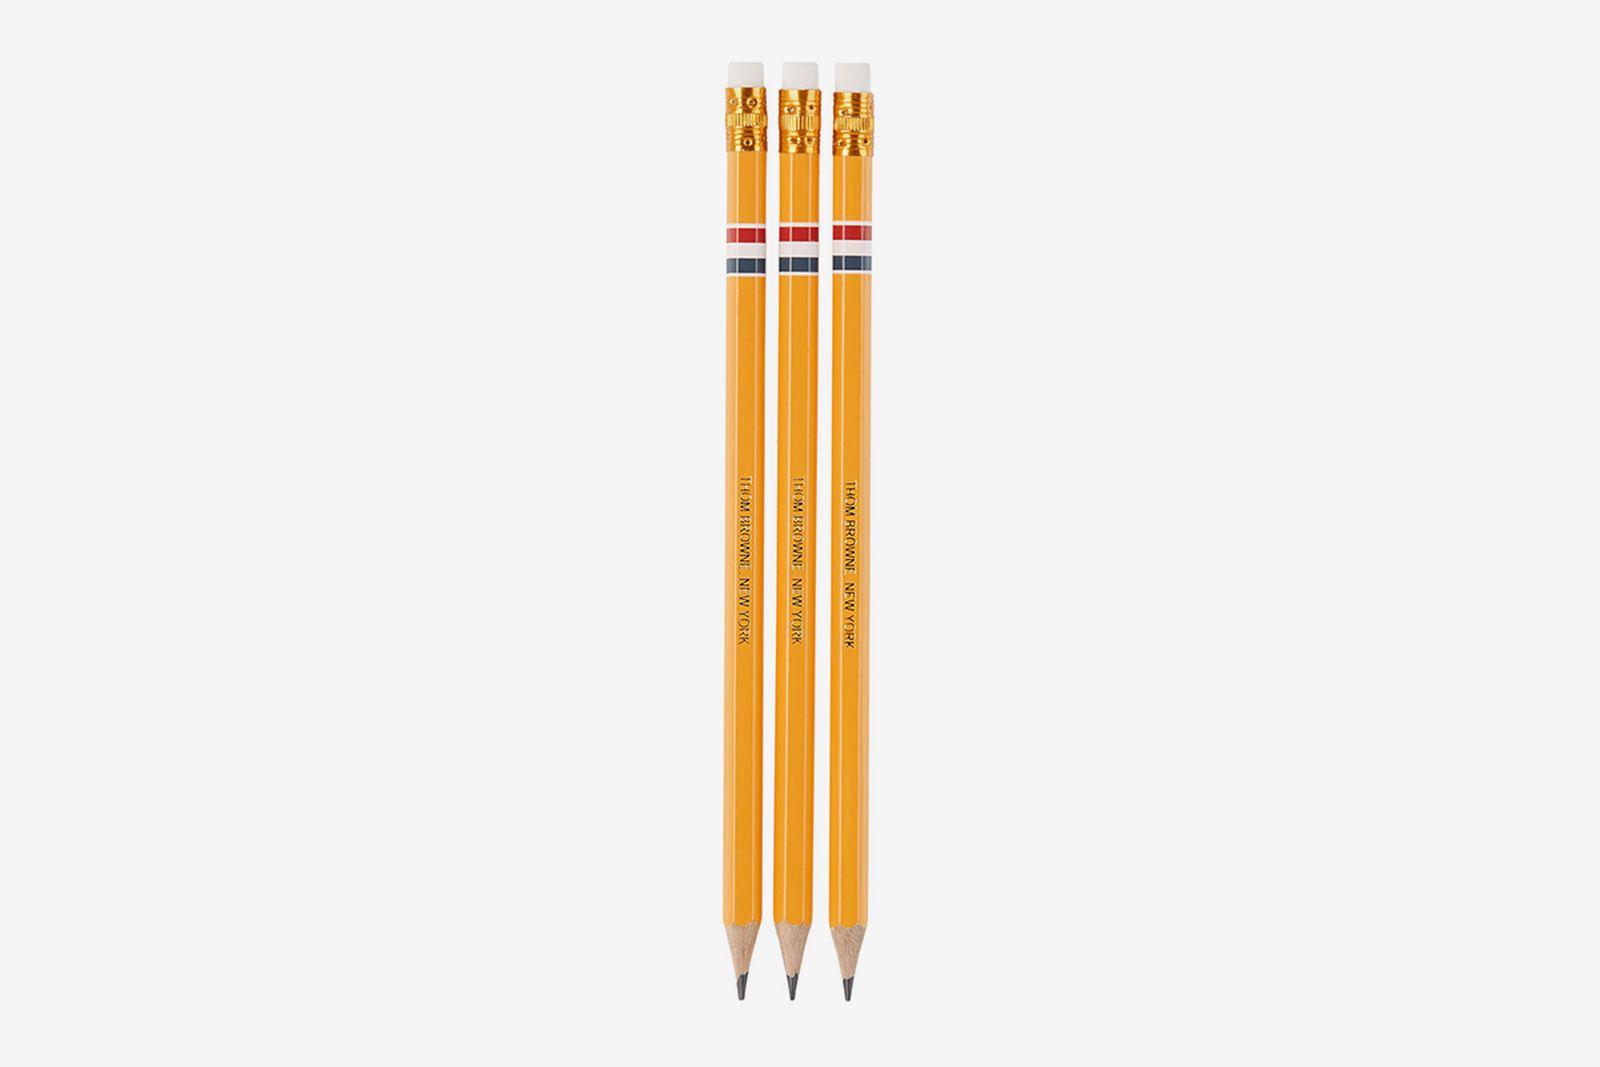 thom-browne-yellow-rwb-4-bar-pencil-set